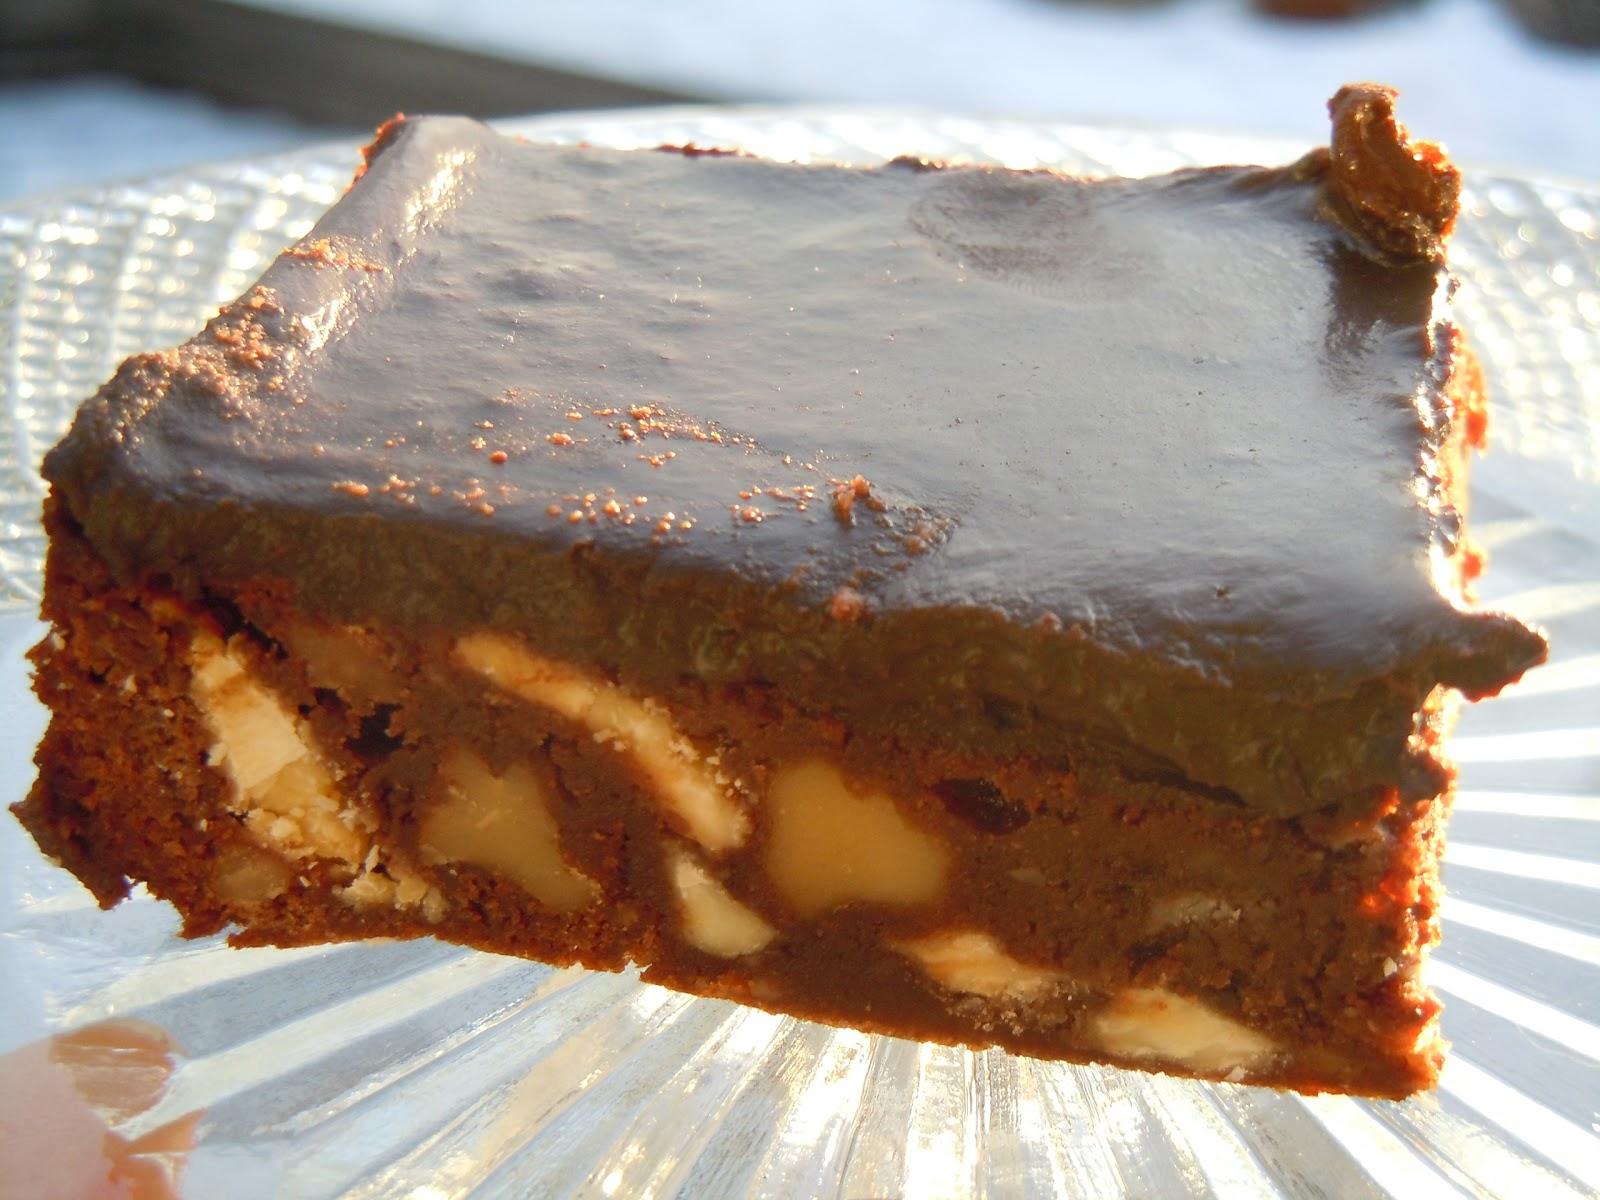 Mat och odla: Leila´s Chocolate Chip Walnut Brownies